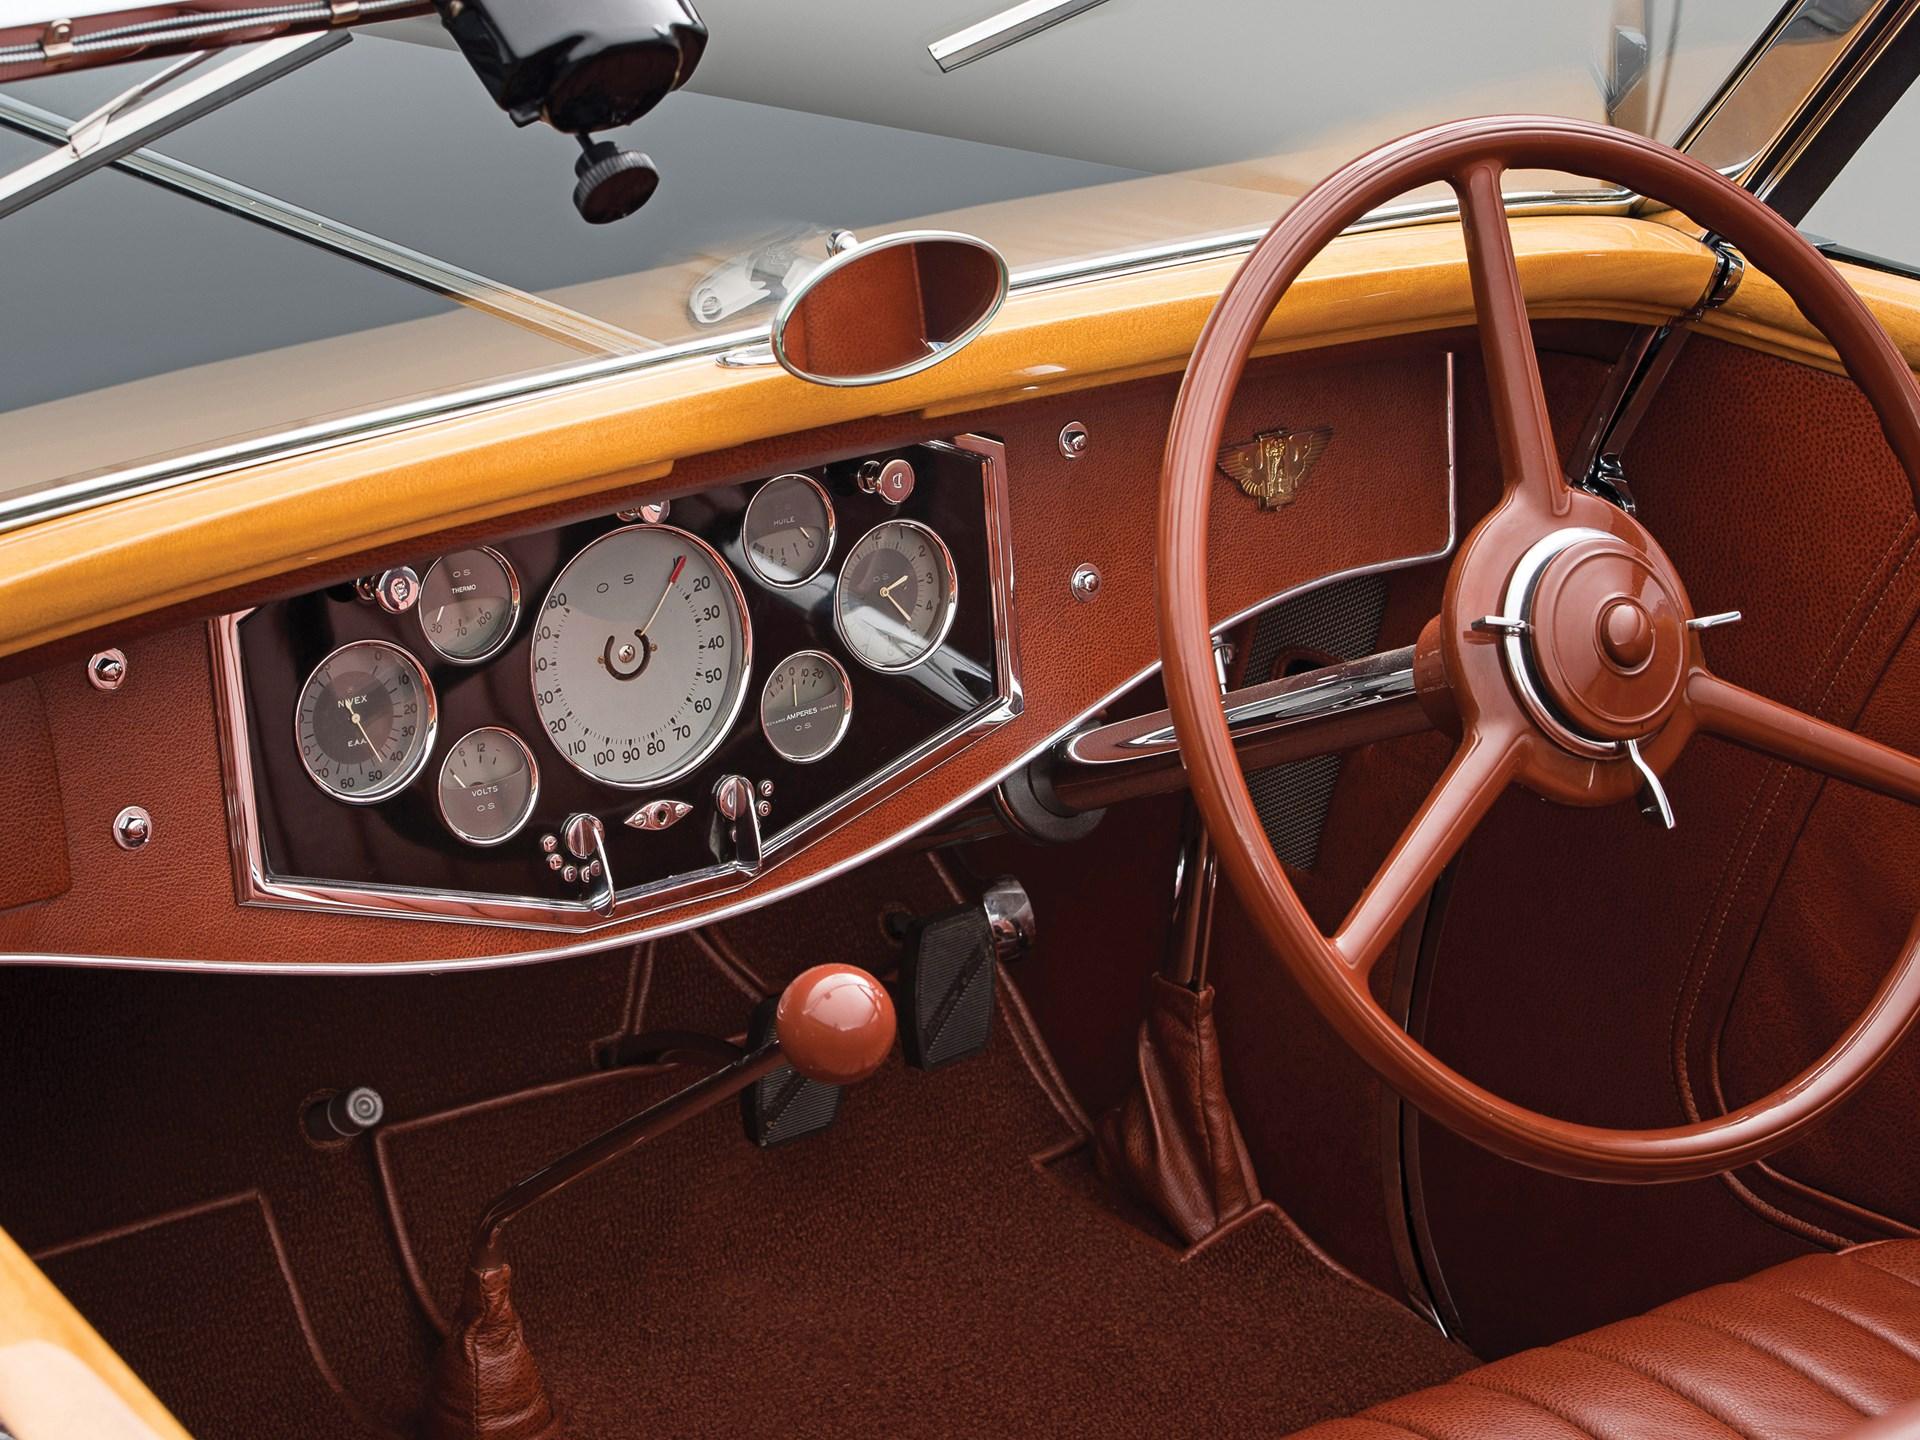 1935 Hispano-Suiza K6 Cabriolet by Brandone